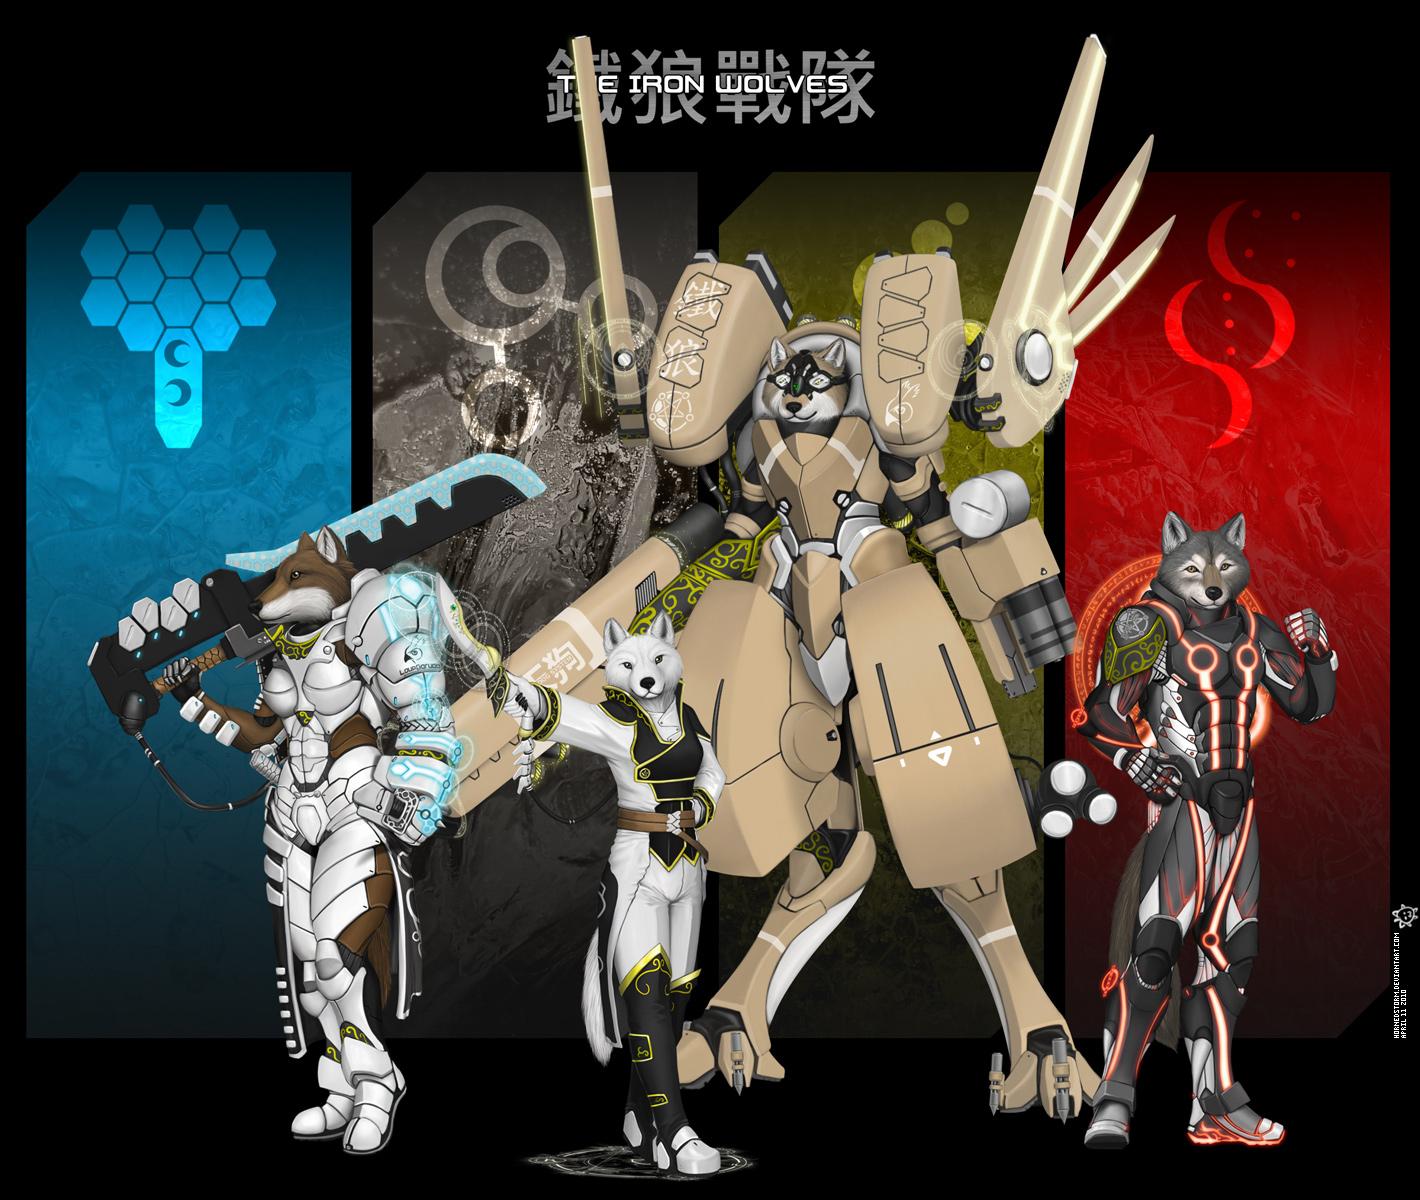 Metallic wolf people